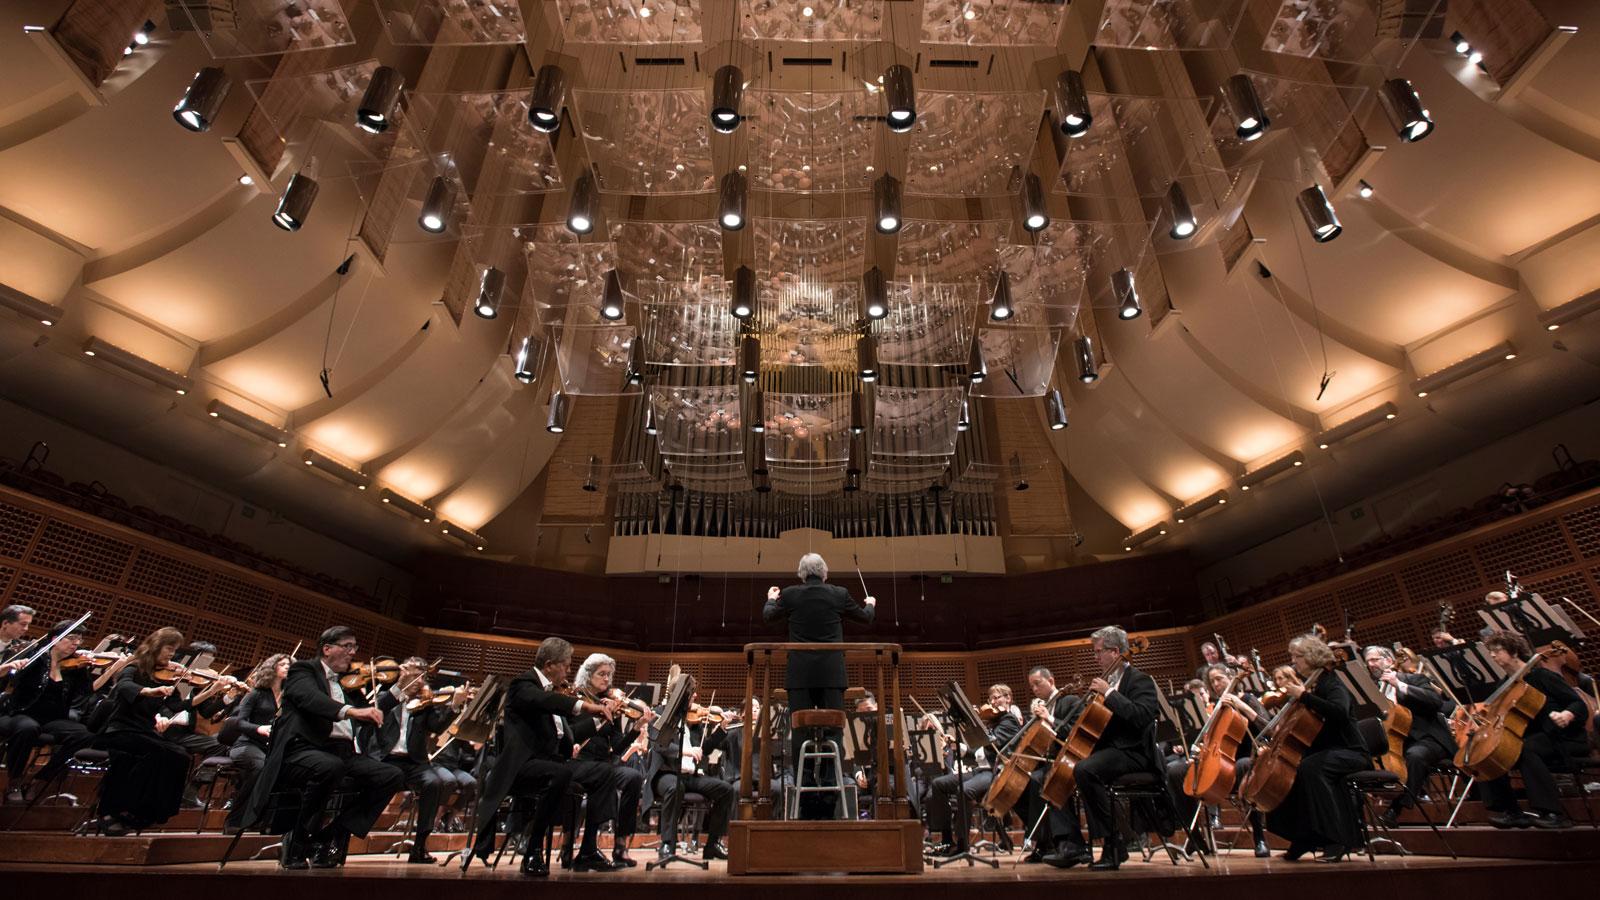 San Francisco Symphony orchestra at Davies Symphony Hall